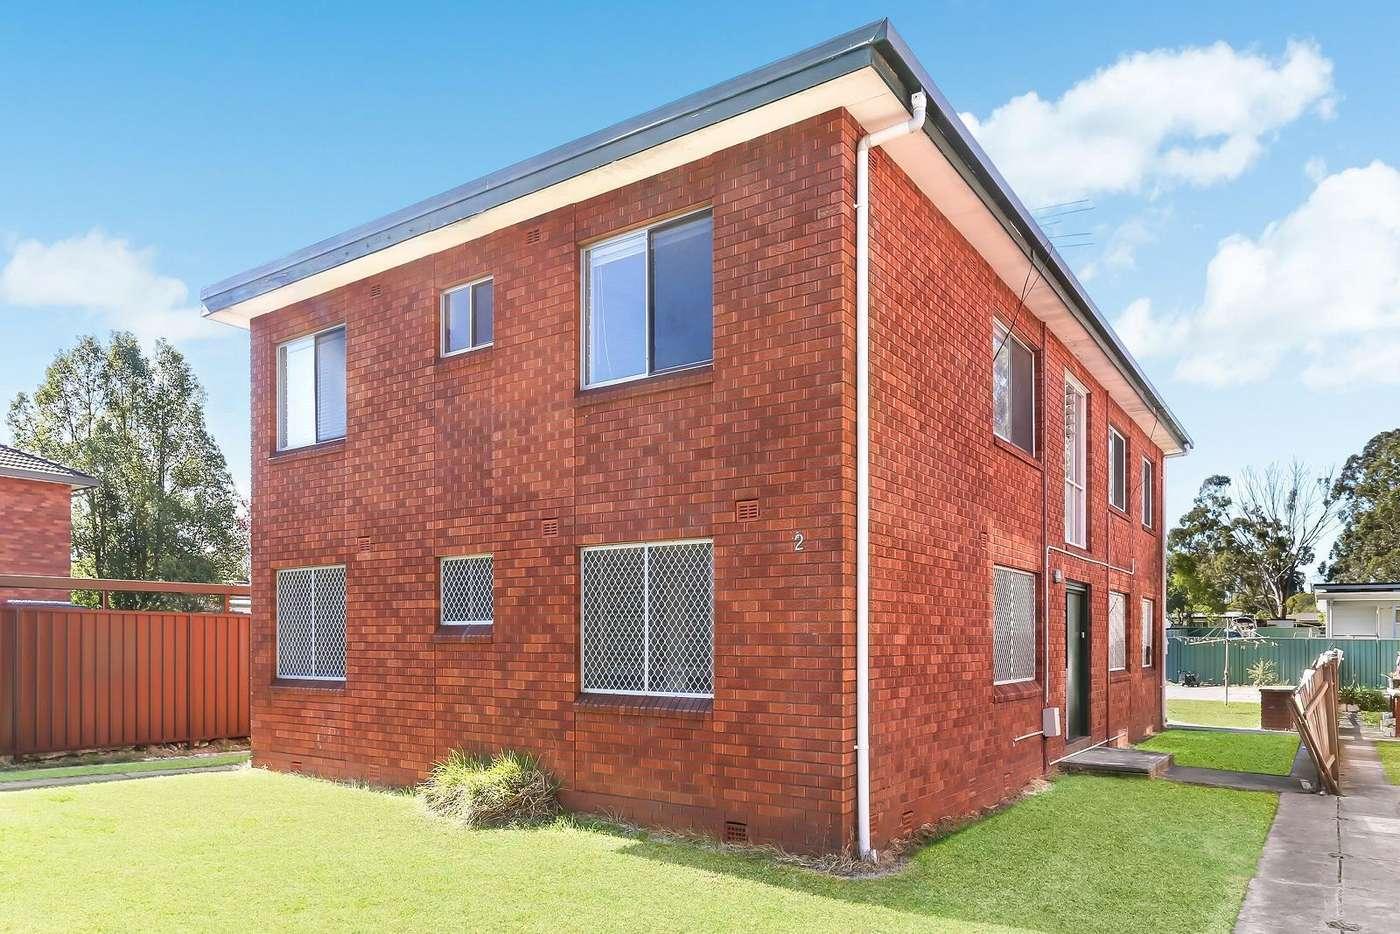 Main view of Homely unit listing, 3/2 Carramar Avenue, Carramar NSW 2163